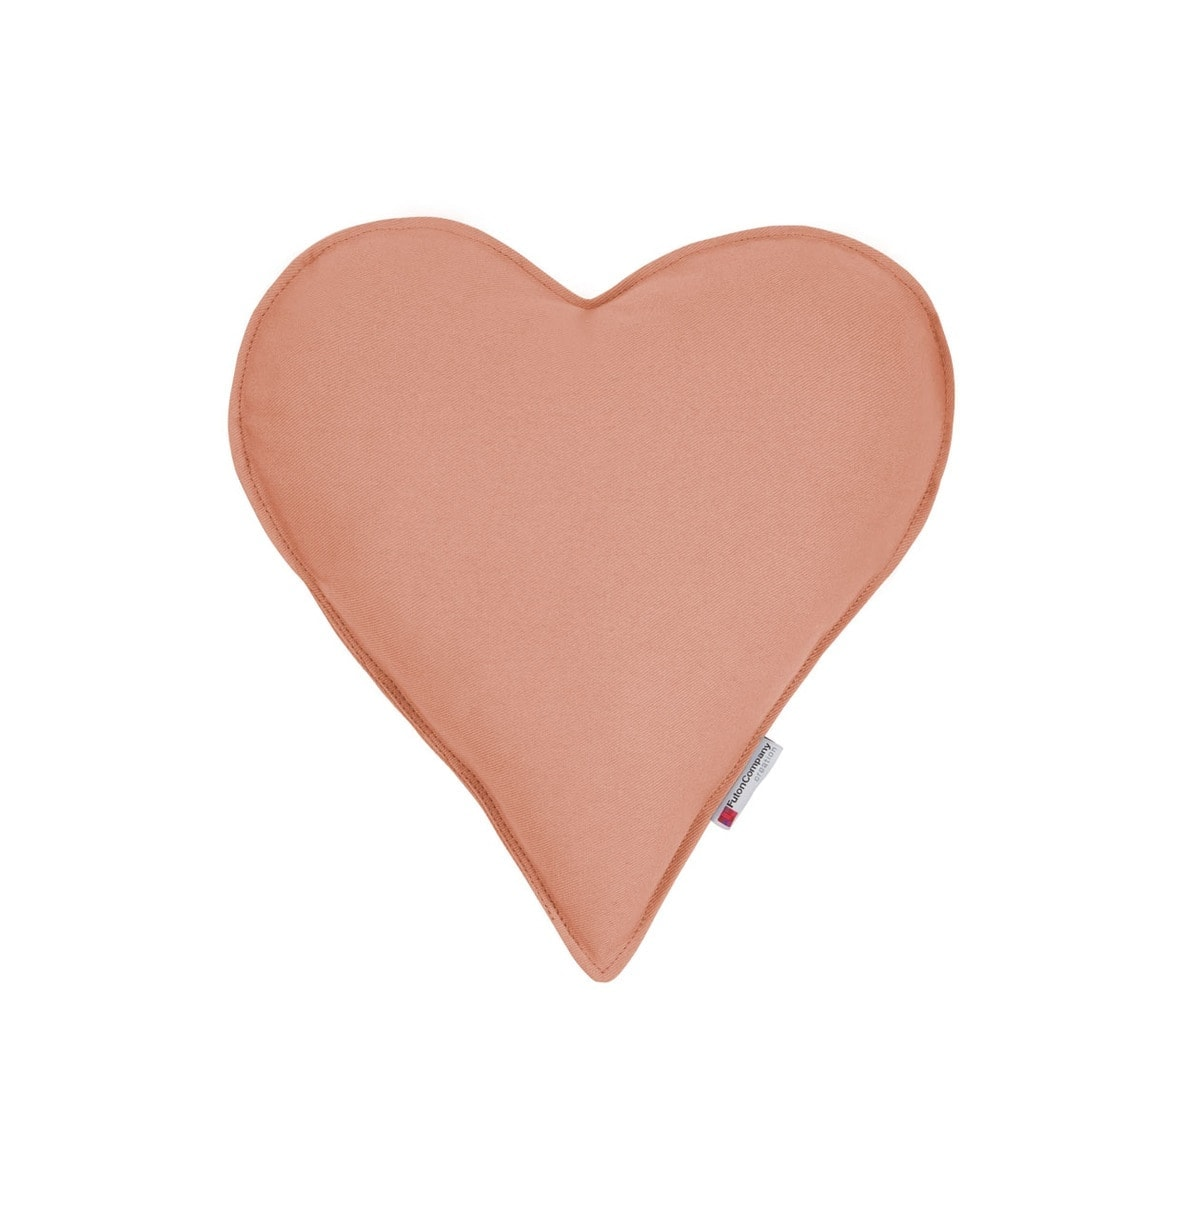 Almofada-Je-t'aime-Sharp-M-Tecido-Lonita-Blush-01